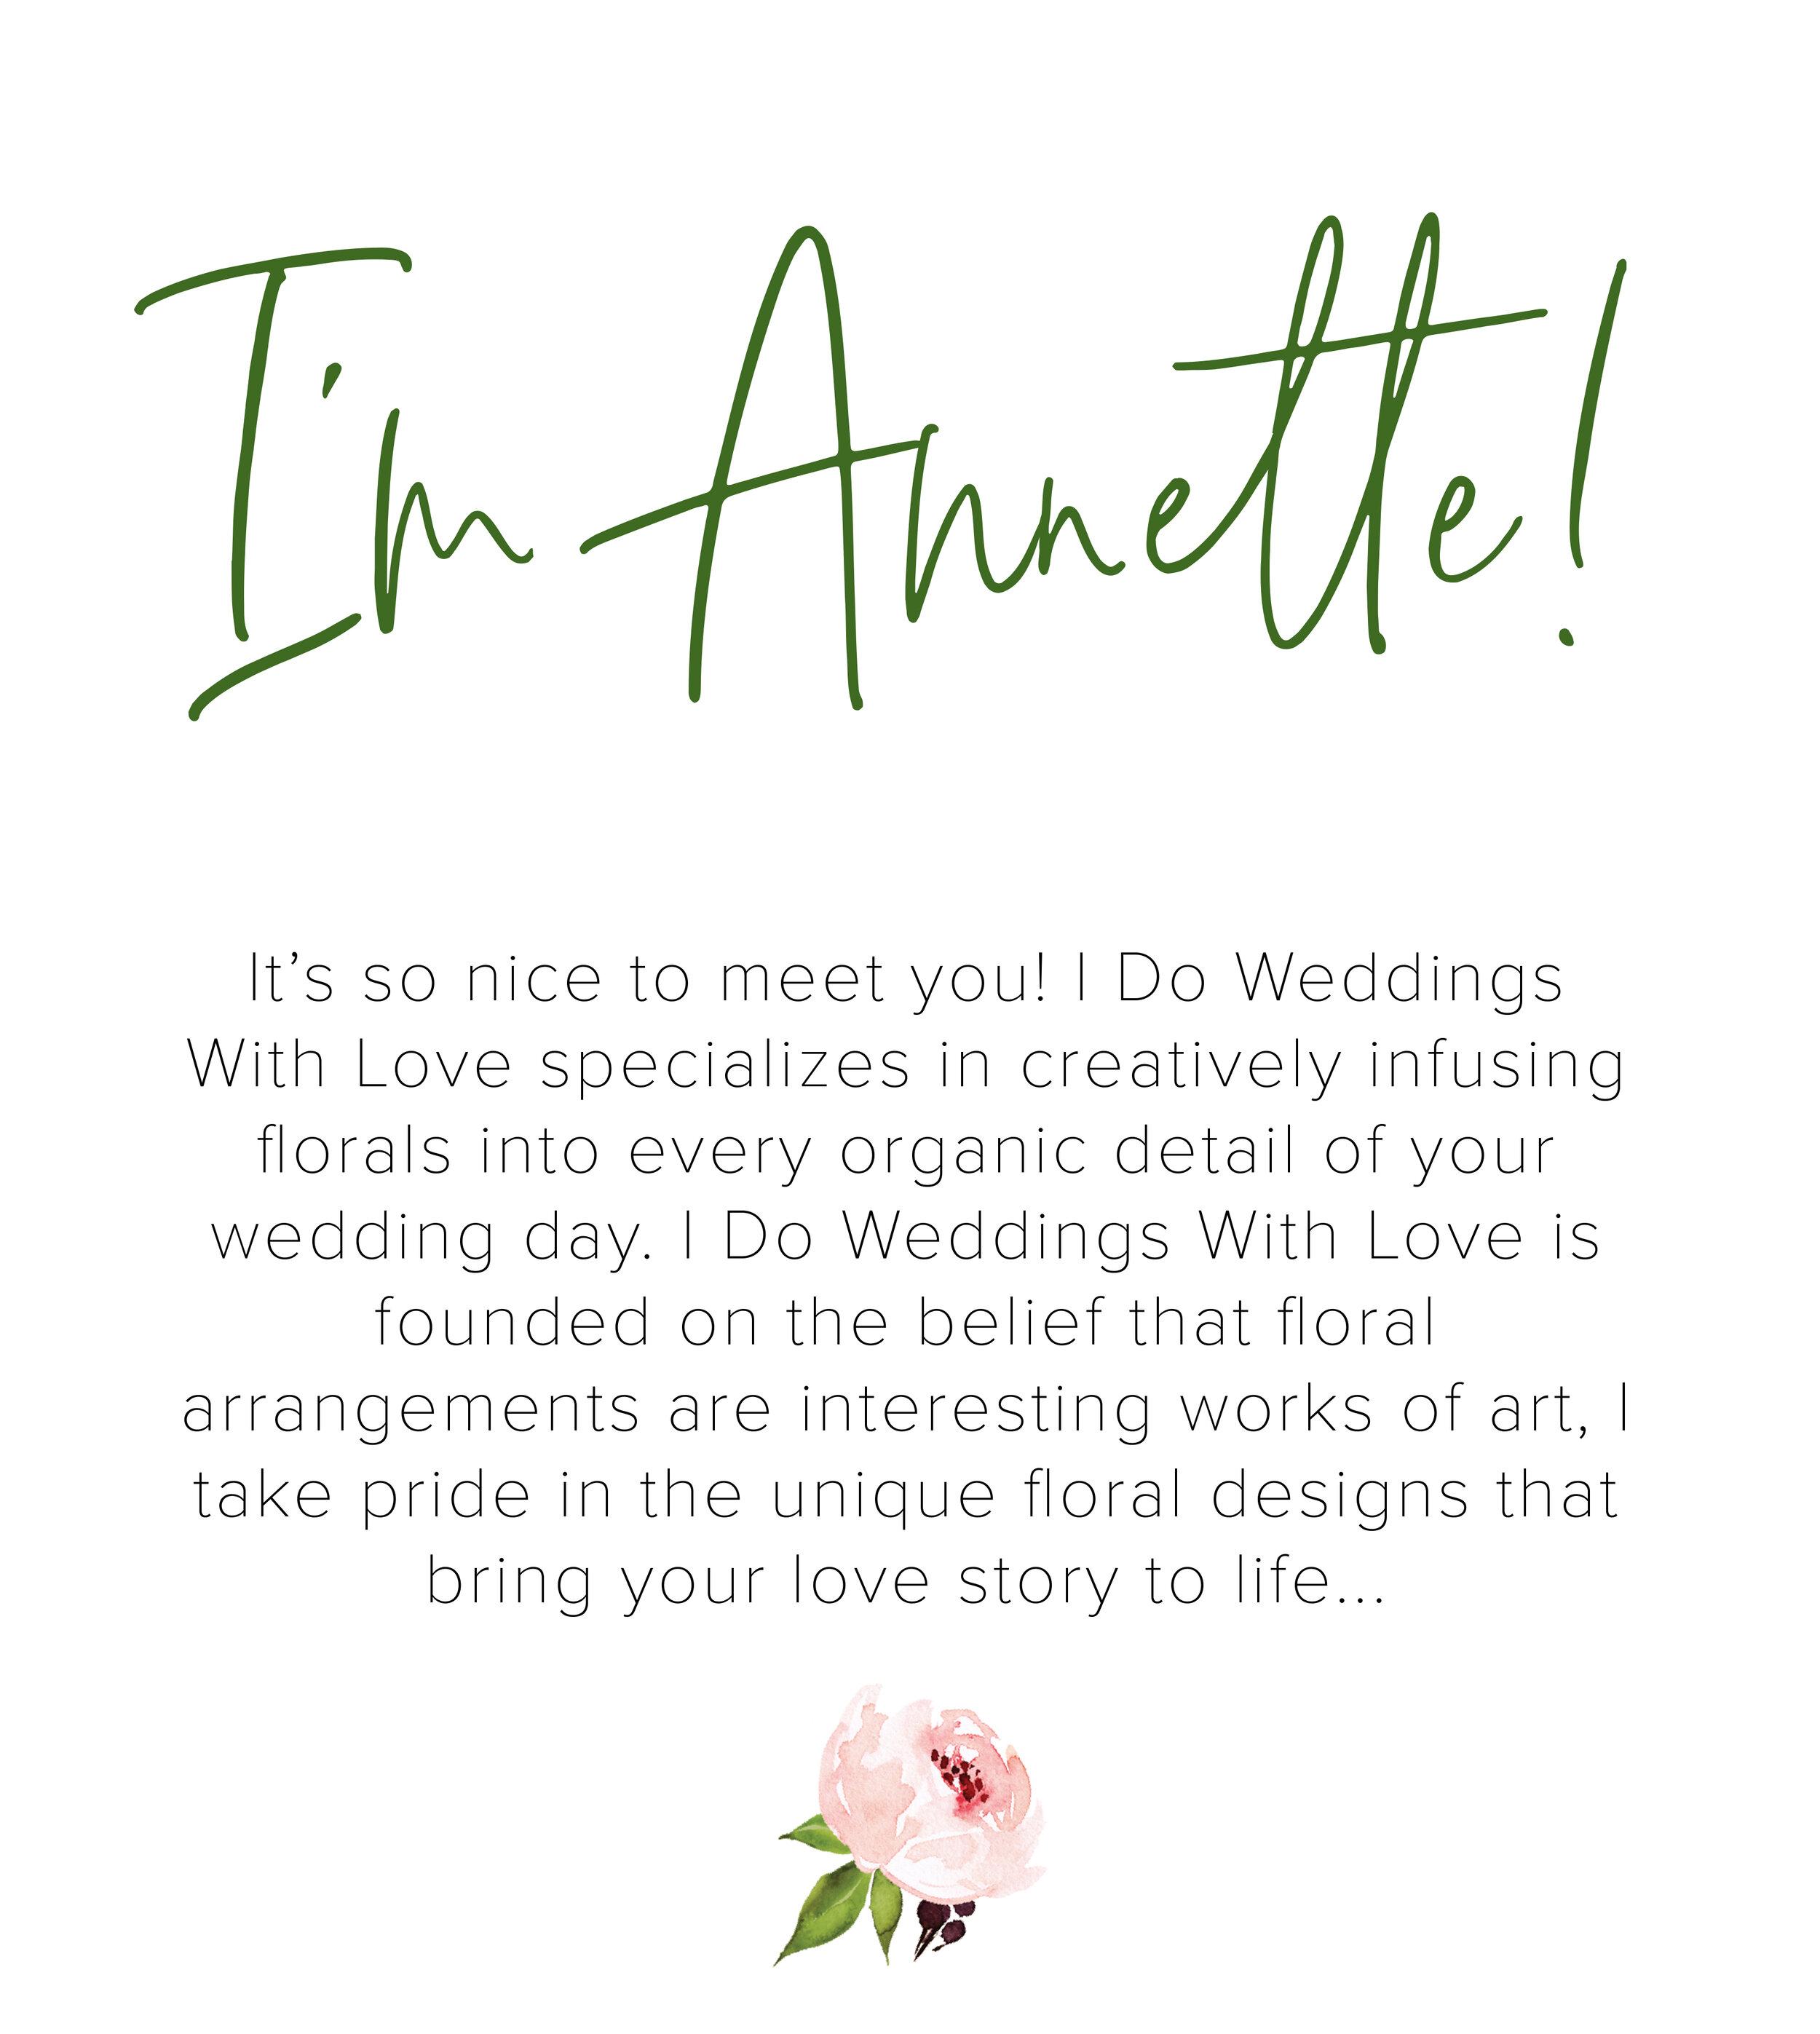 annette-i-do-weddings-with-love-wedding-florist